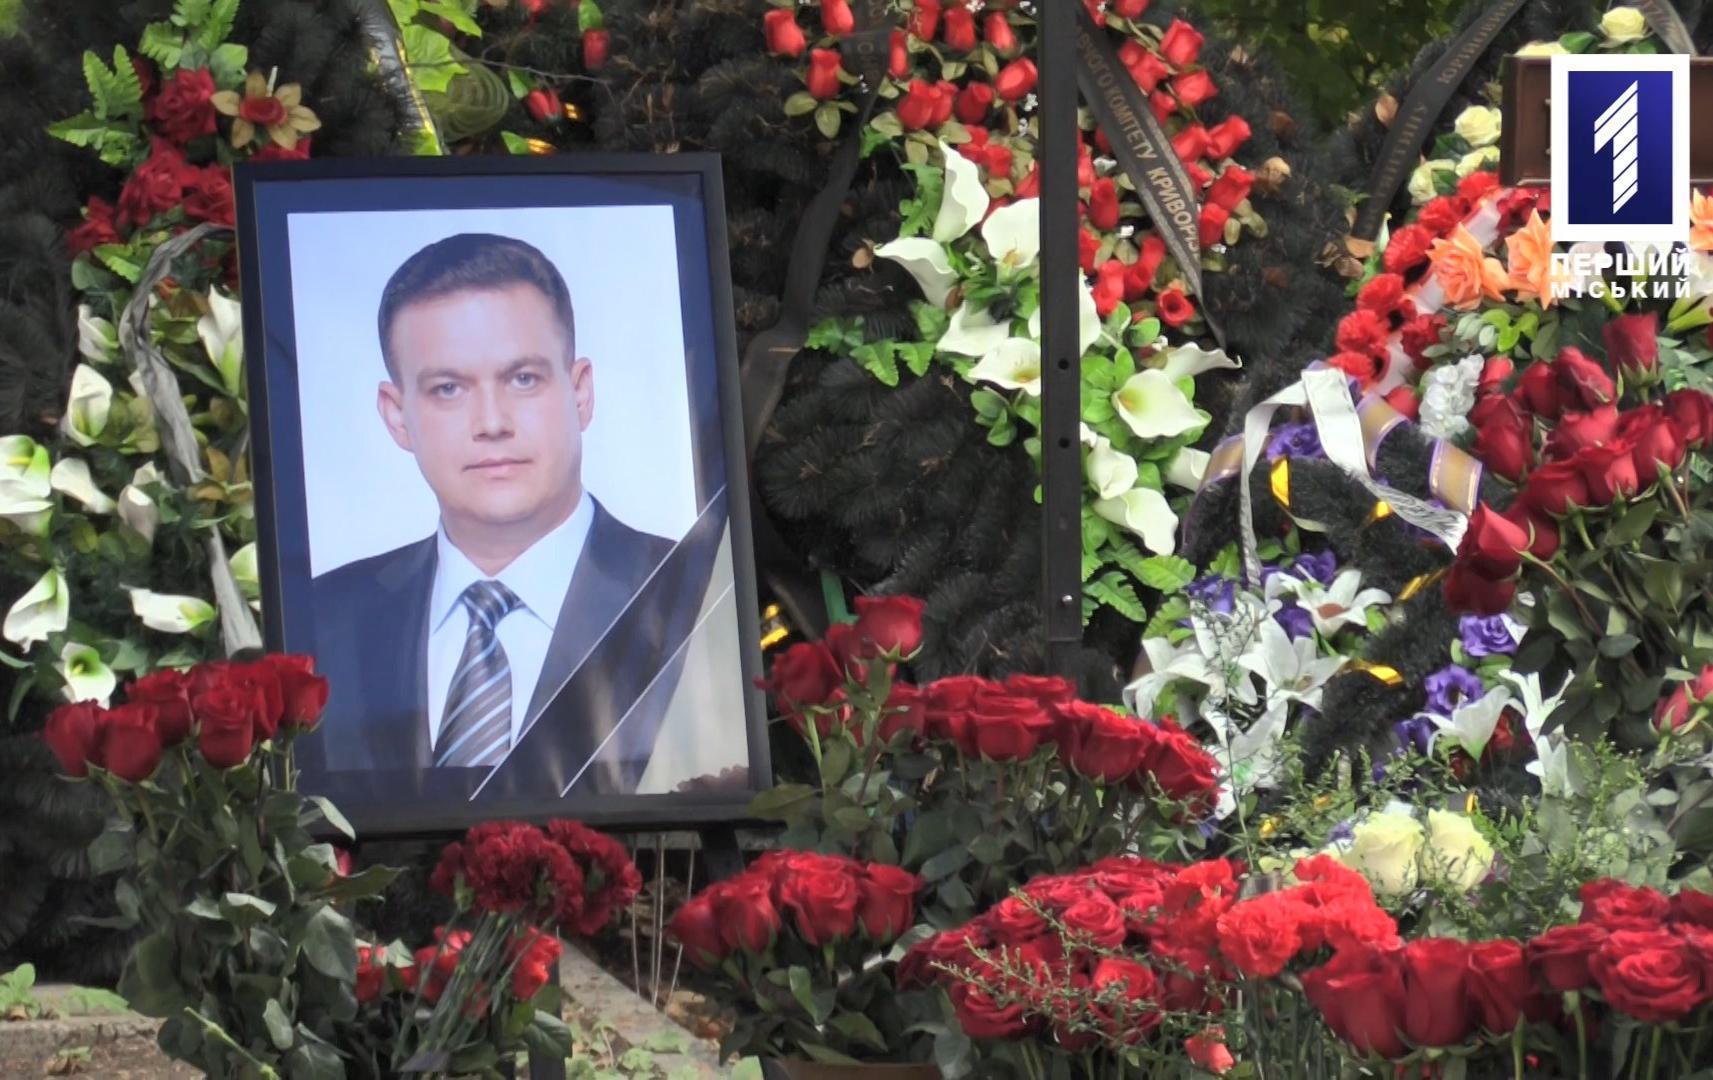 Панихида в честь 40 дней с момента смерти мэра Кривого Рога Константина Павлова